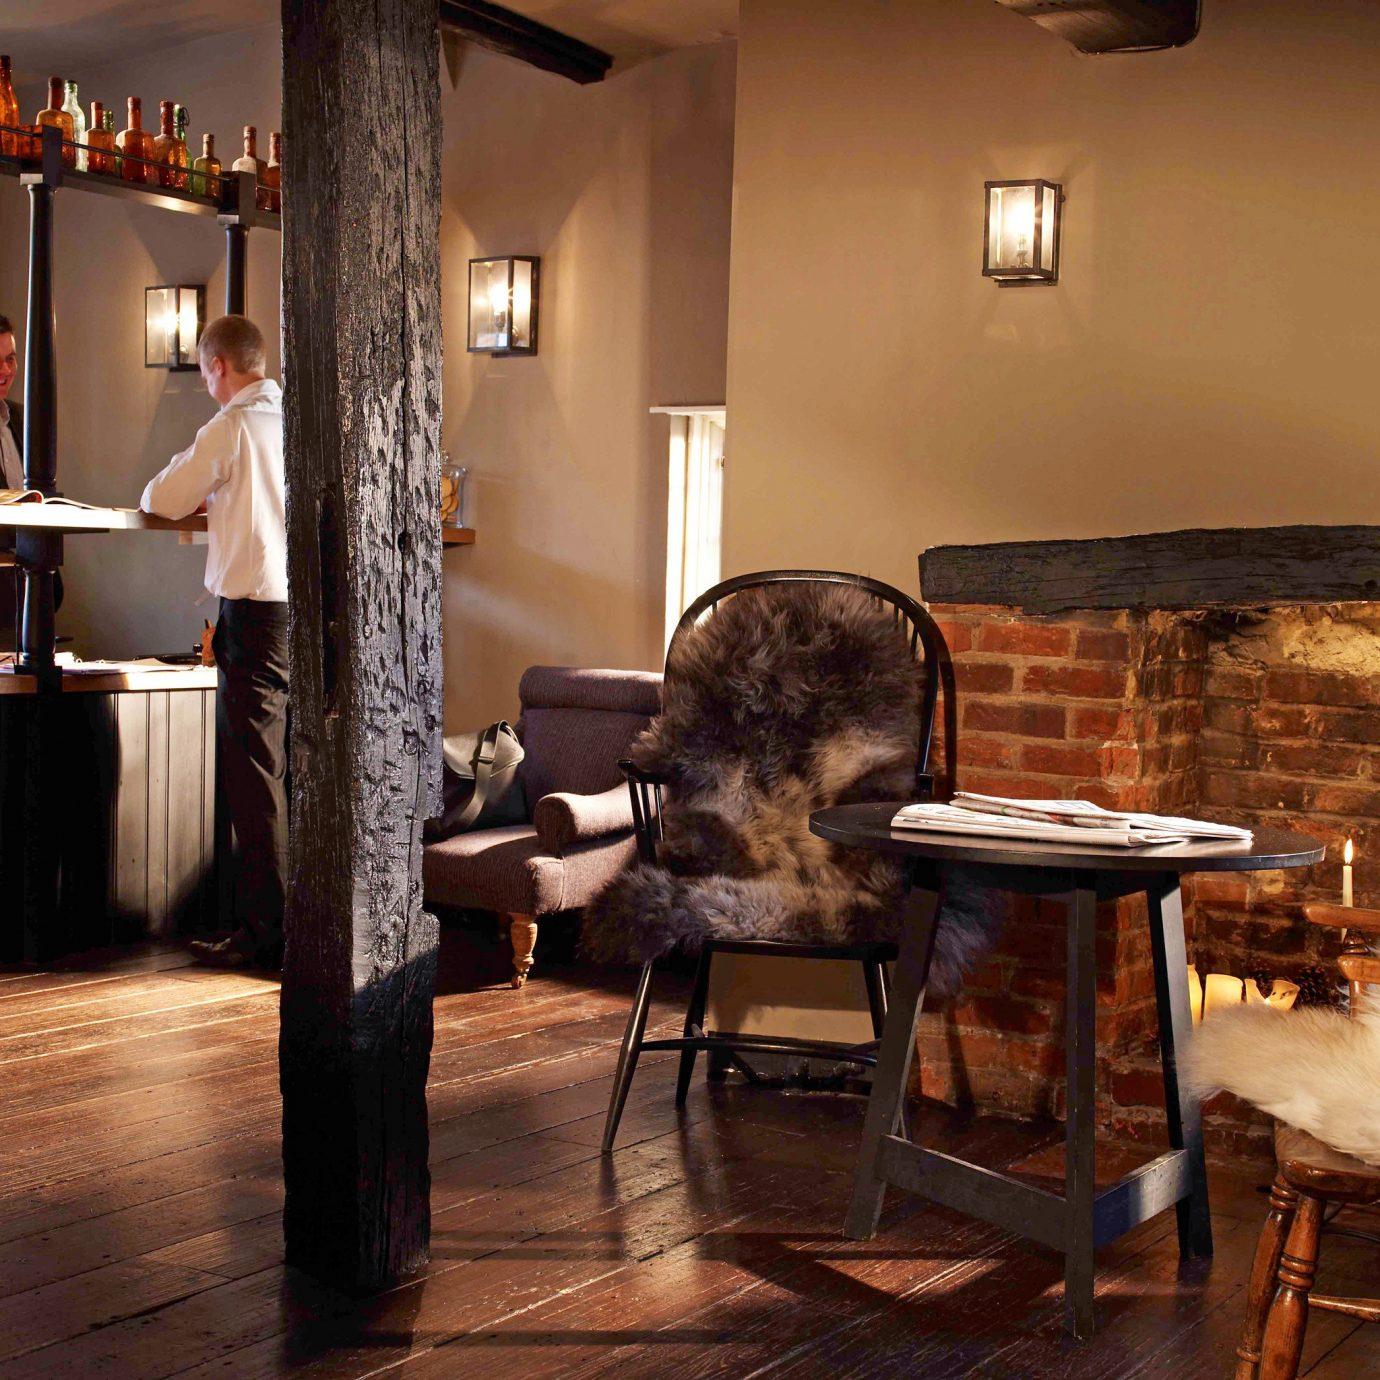 Bar Inn Rustic home living room flooring cottage restaurant cluttered